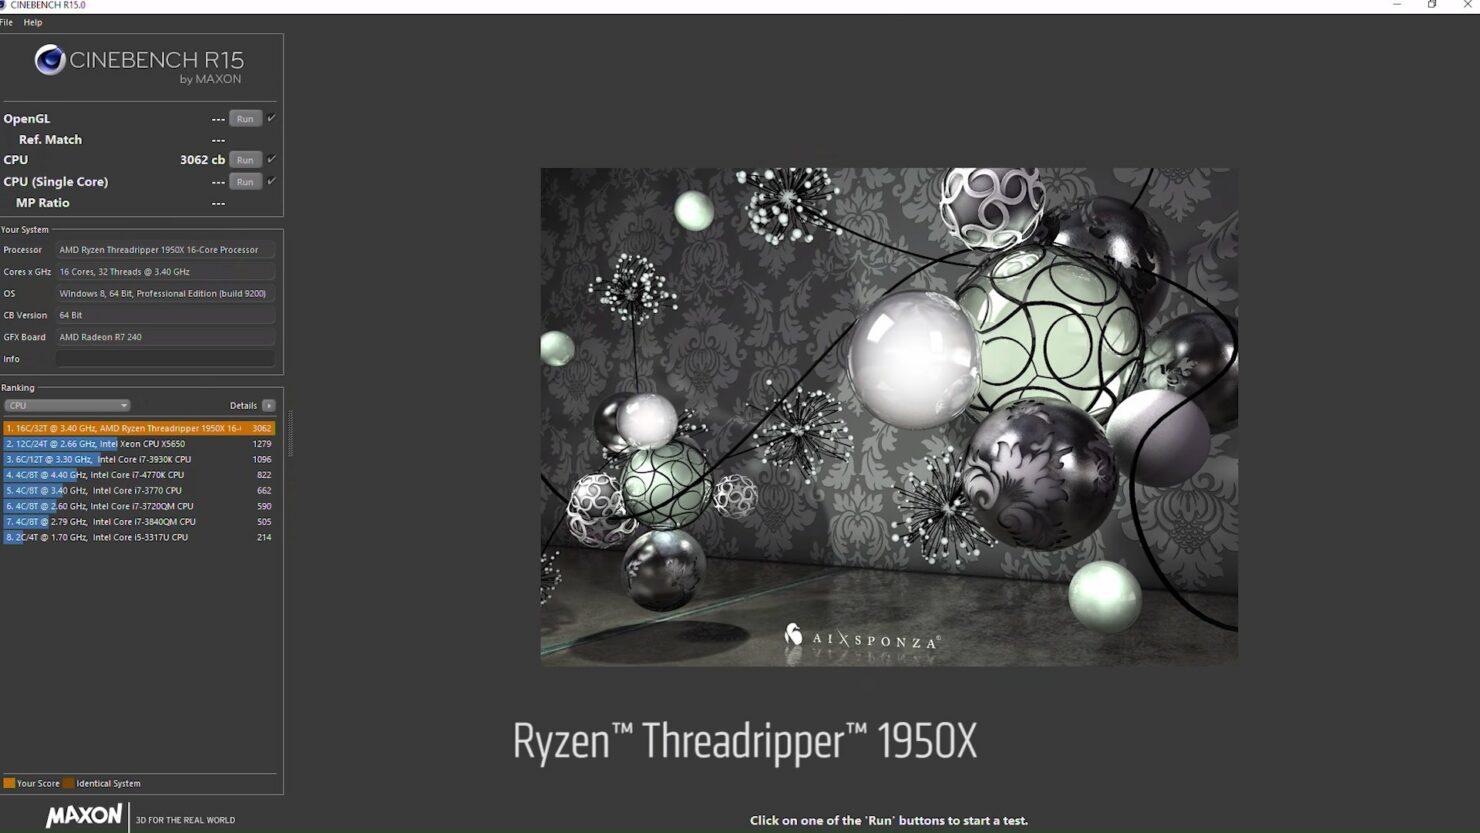 amd-threadripper-1950x-cinebench-r15